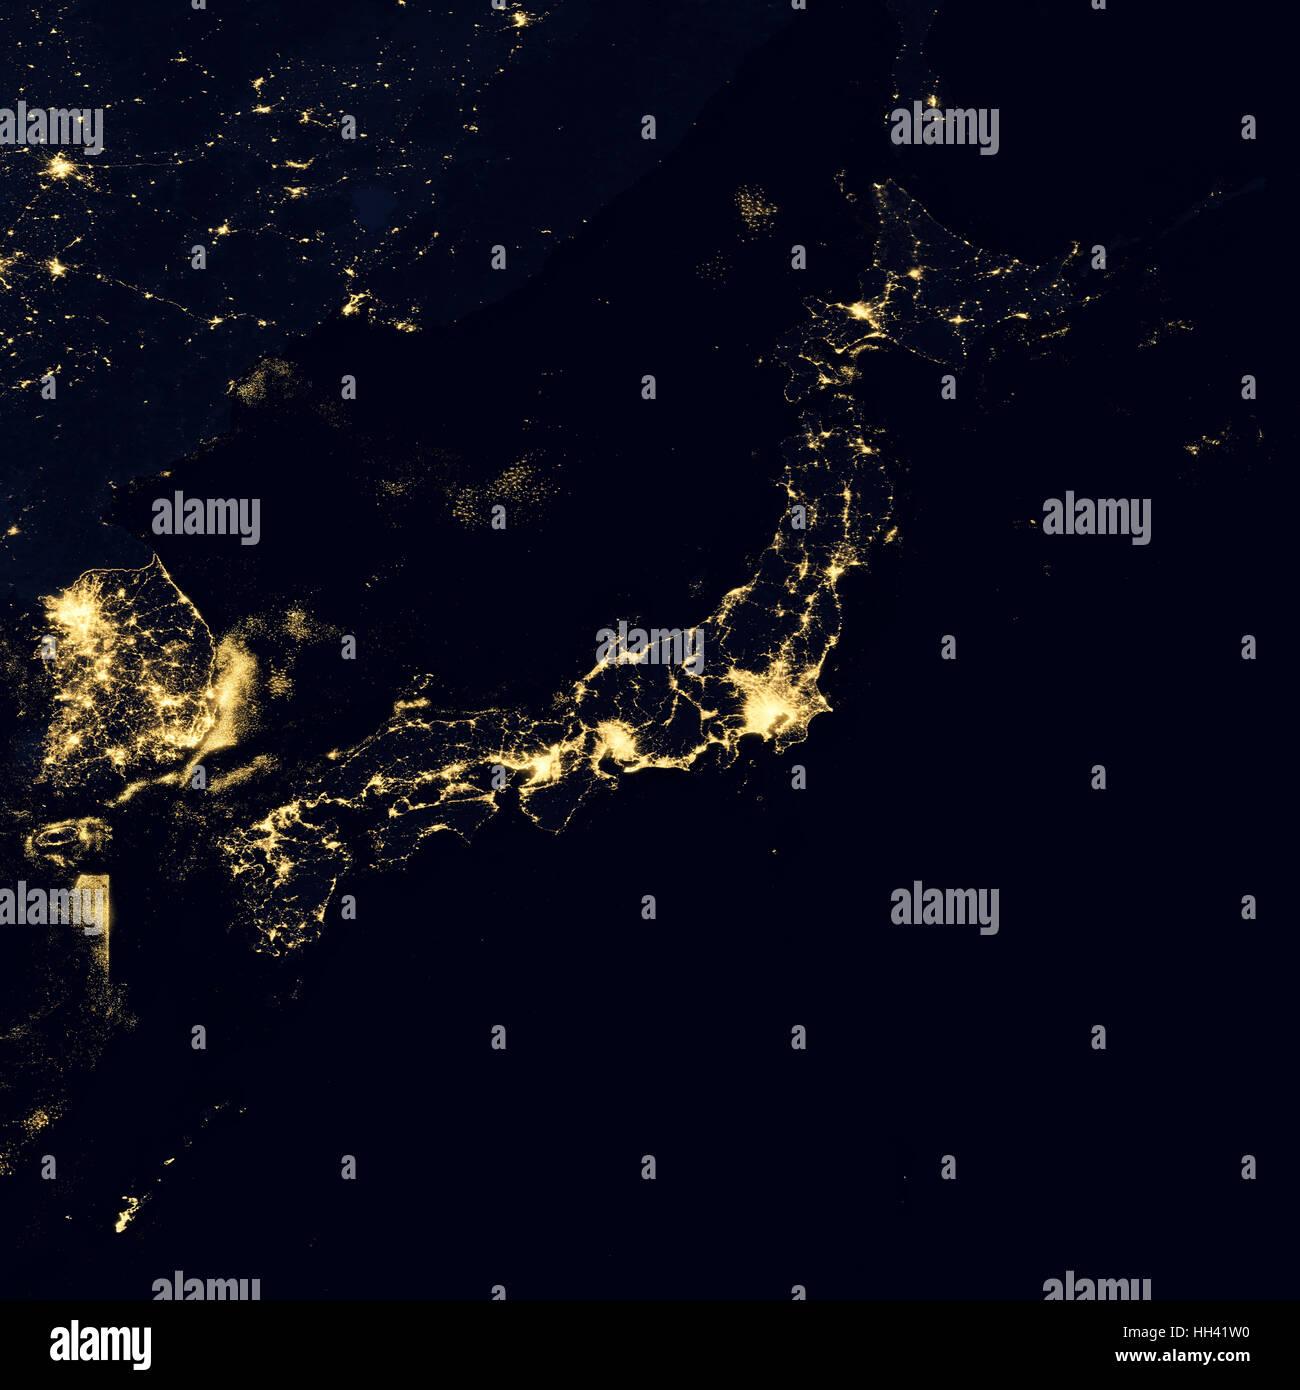 City lights on world map japan stock photo royalty free image city lights on world map japan gumiabroncs Choice Image